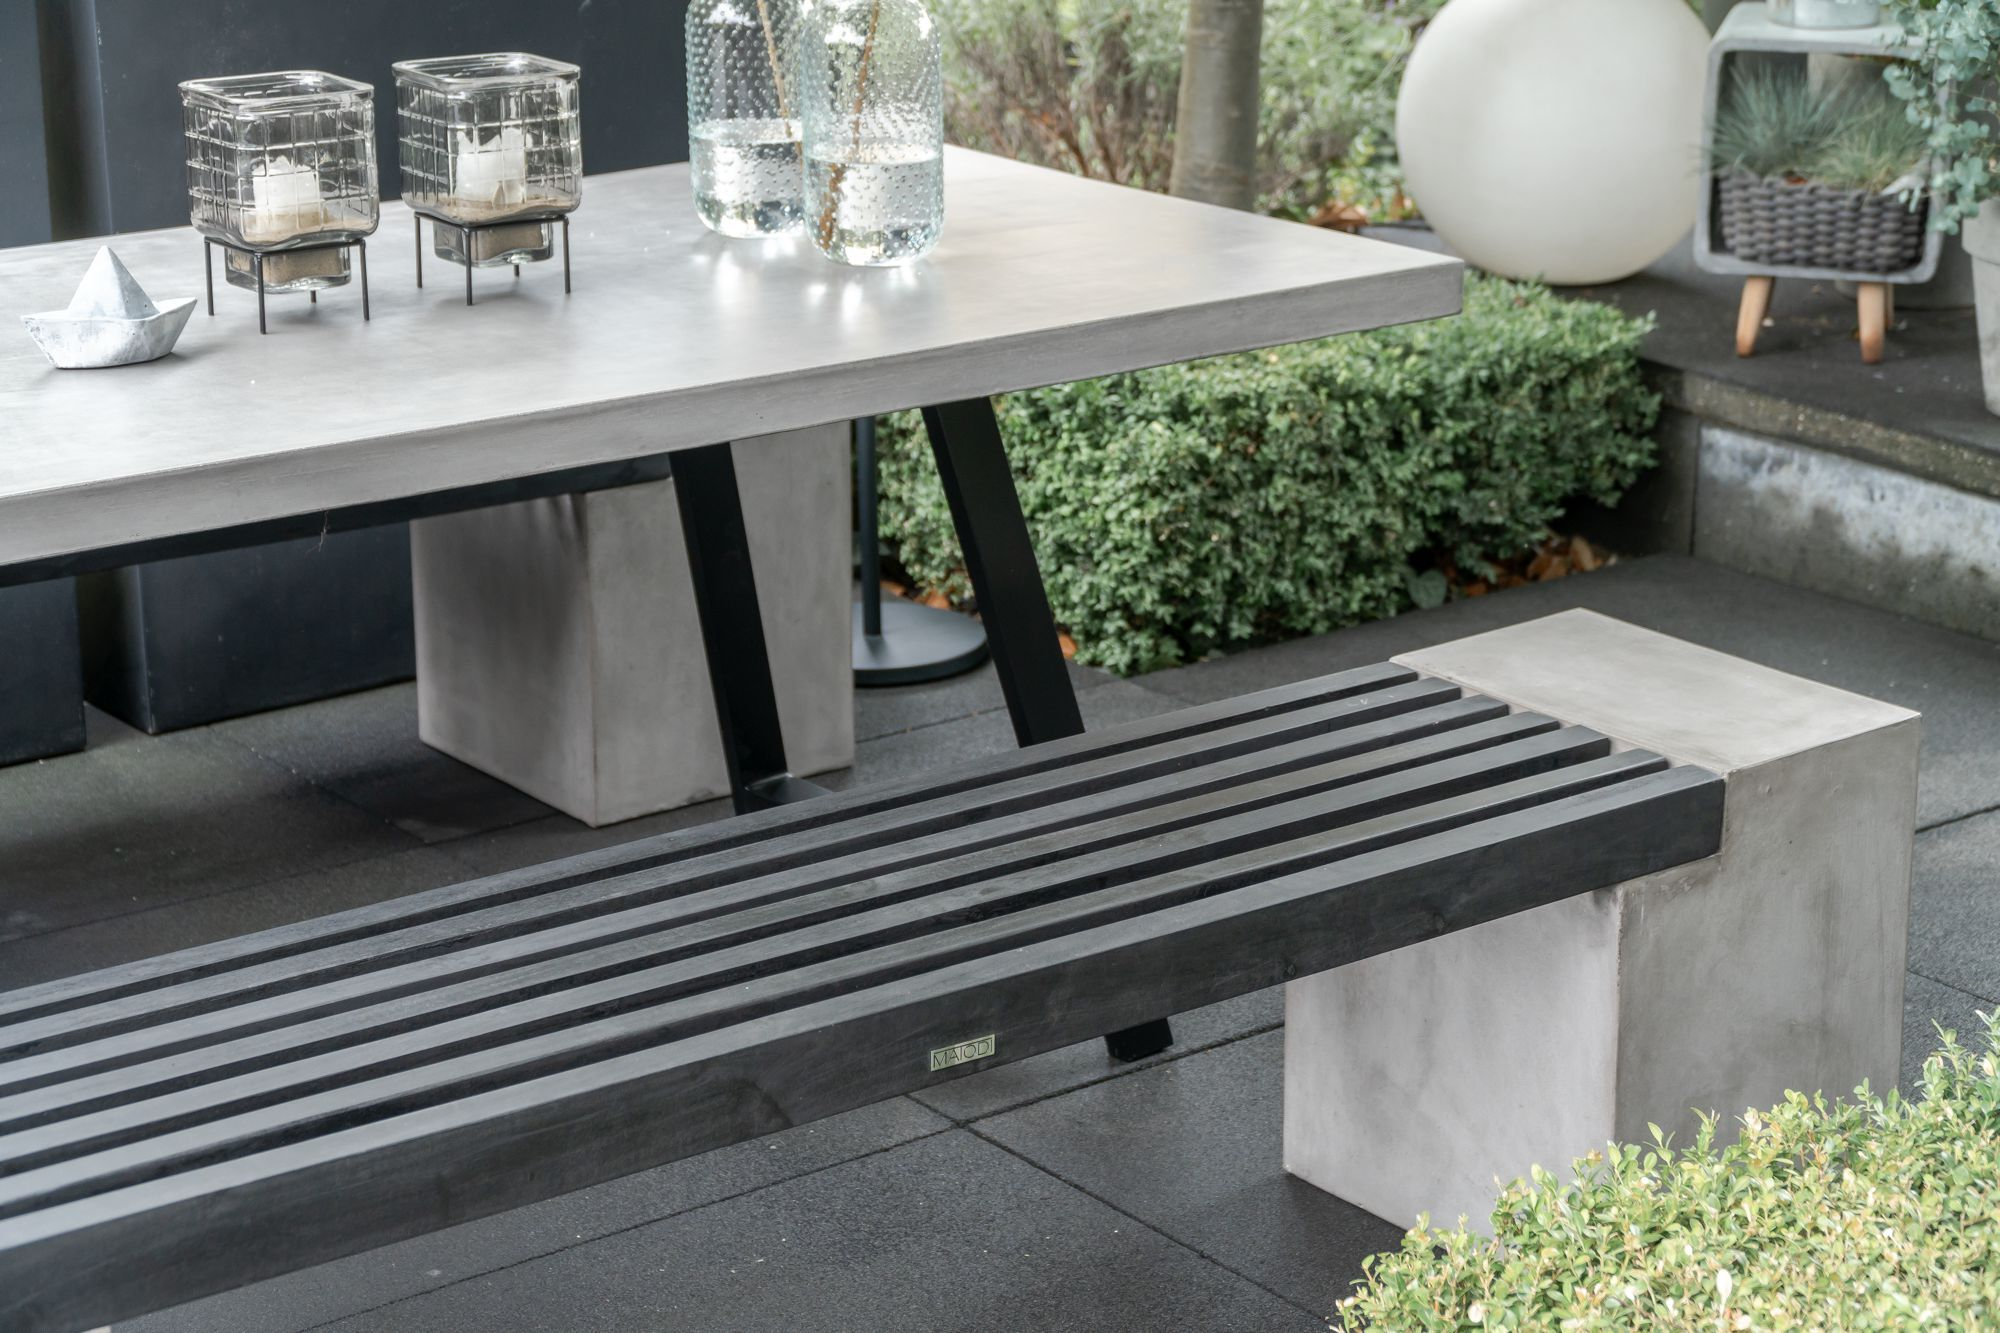 Novum Betonbank Gartenbank Akazienholz 200 Cm In 2021 Terrasse Sitzgruppe Terrassentisch Gartentisch Betonoptik